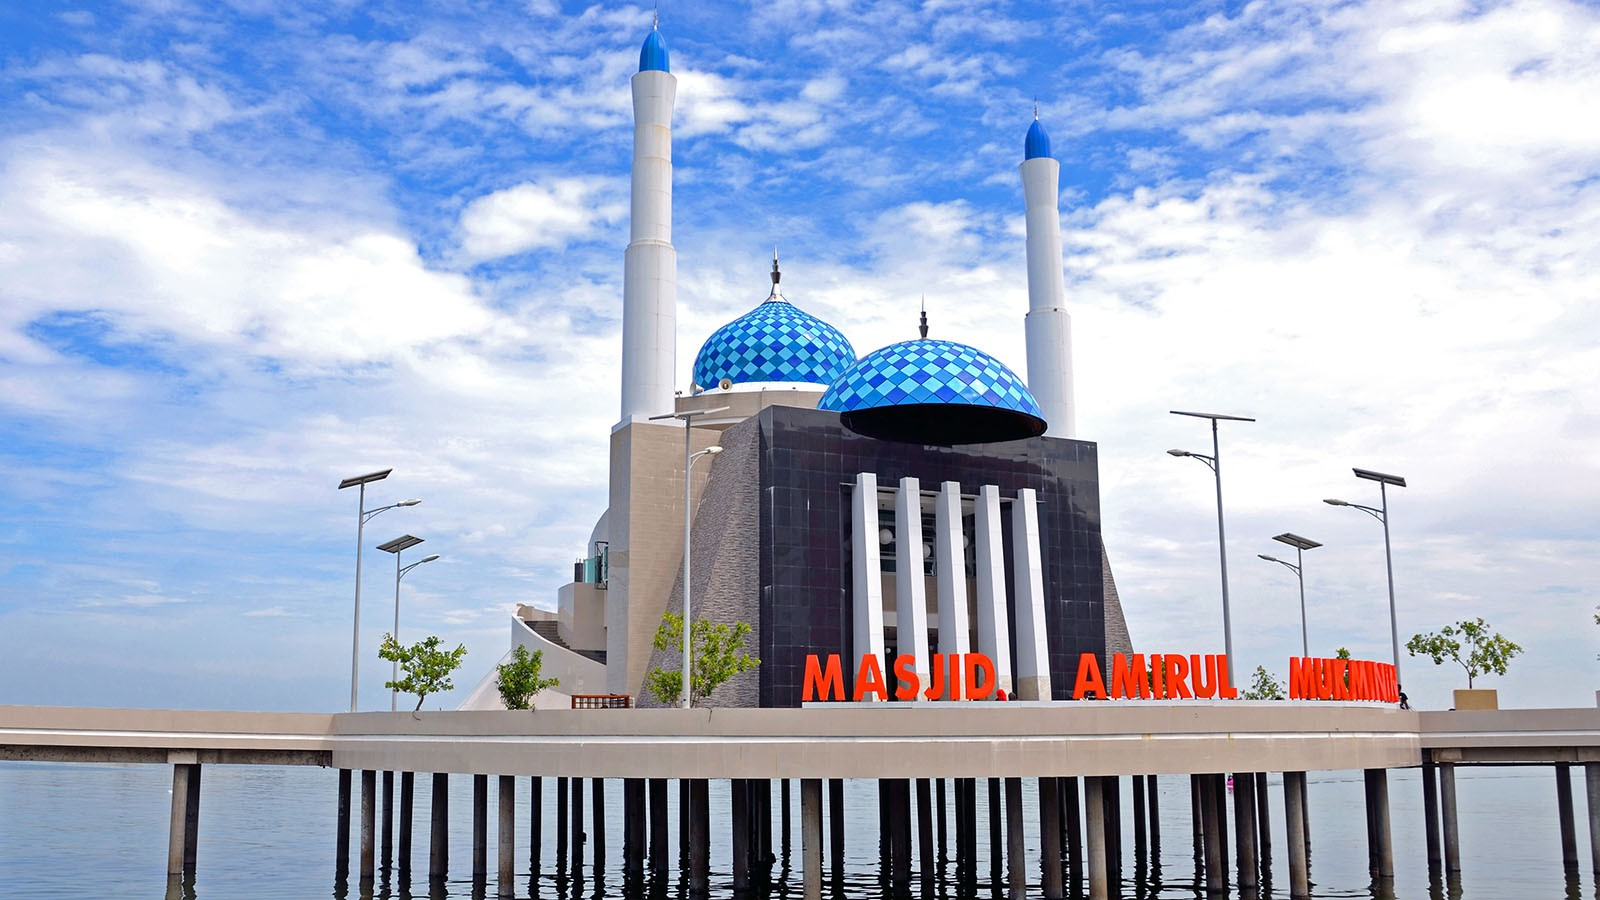 Losari Jangan Lupa Nikmati Sunset Masjid Apung Saliha 2017 09